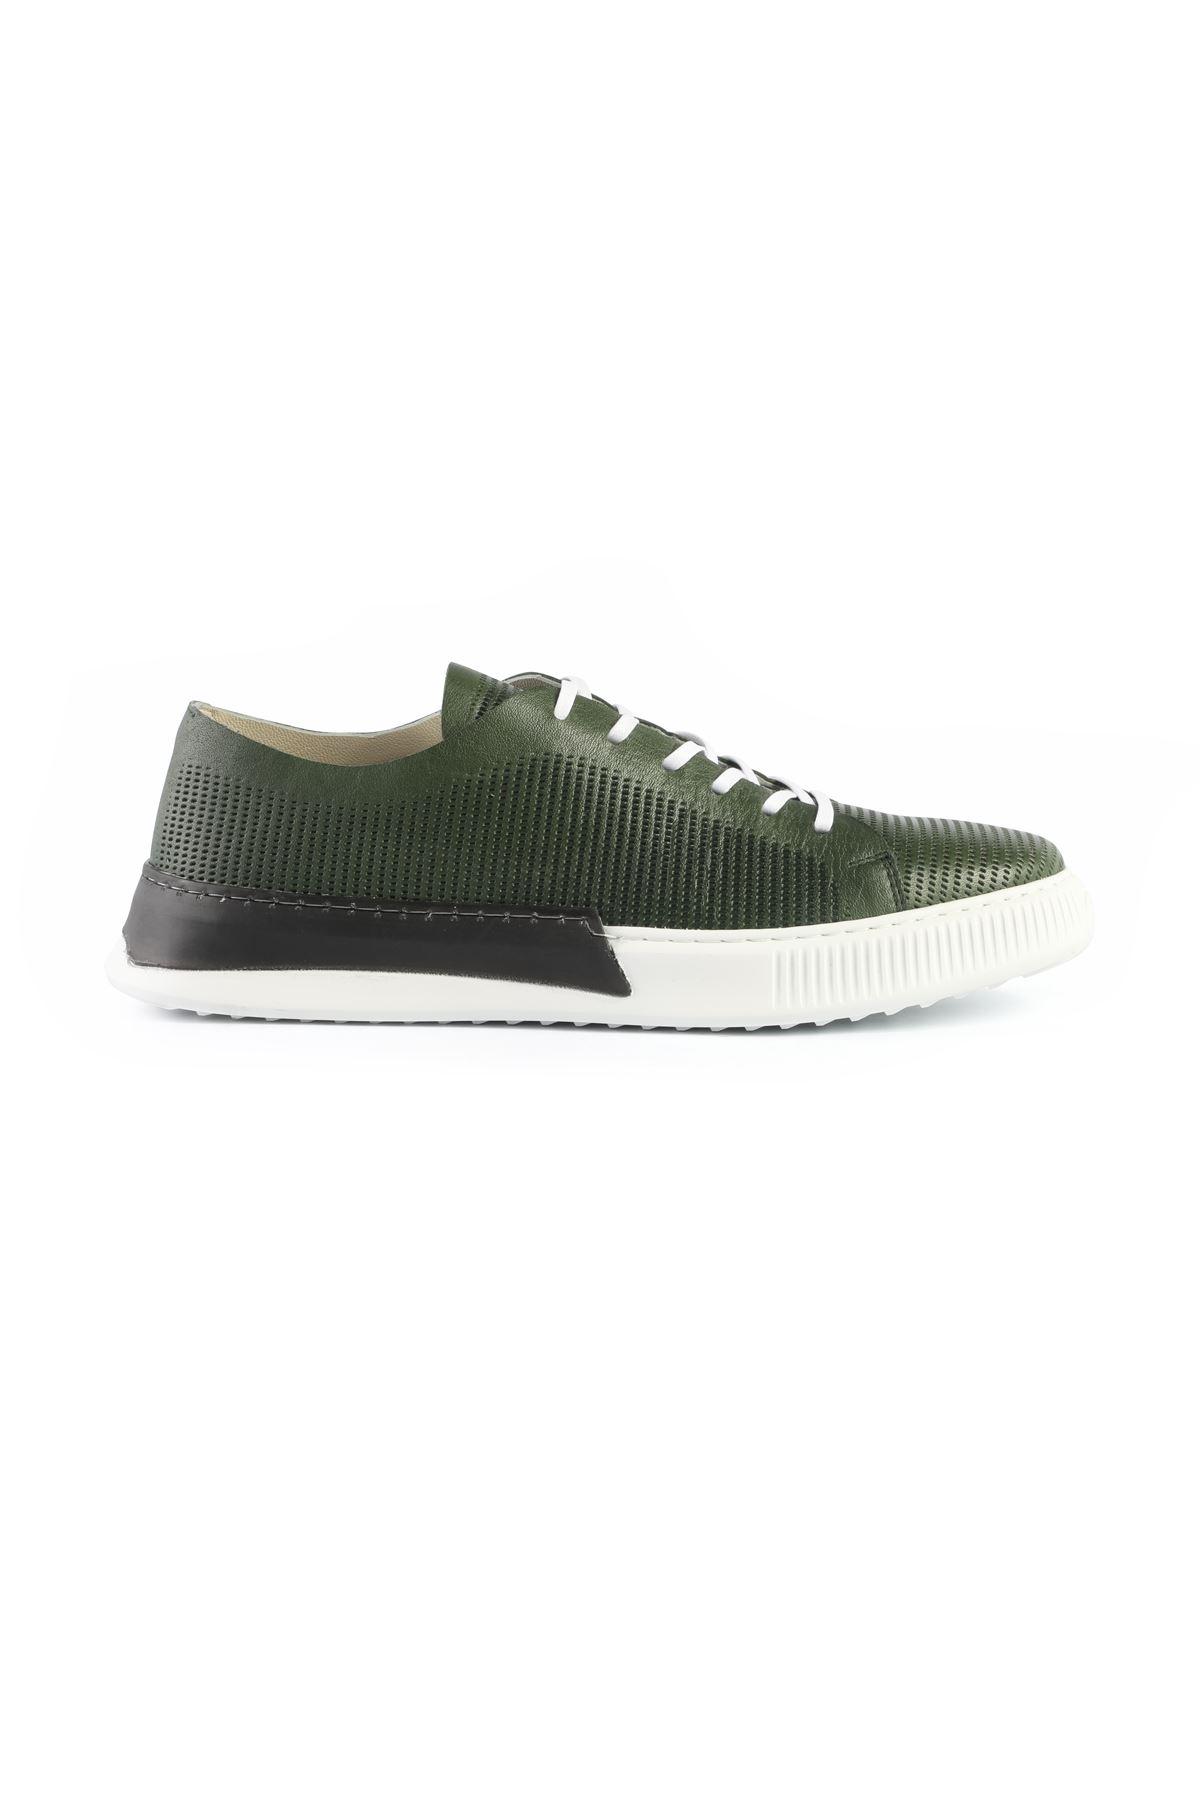 Libero L3411 Green Sneaker Shoes